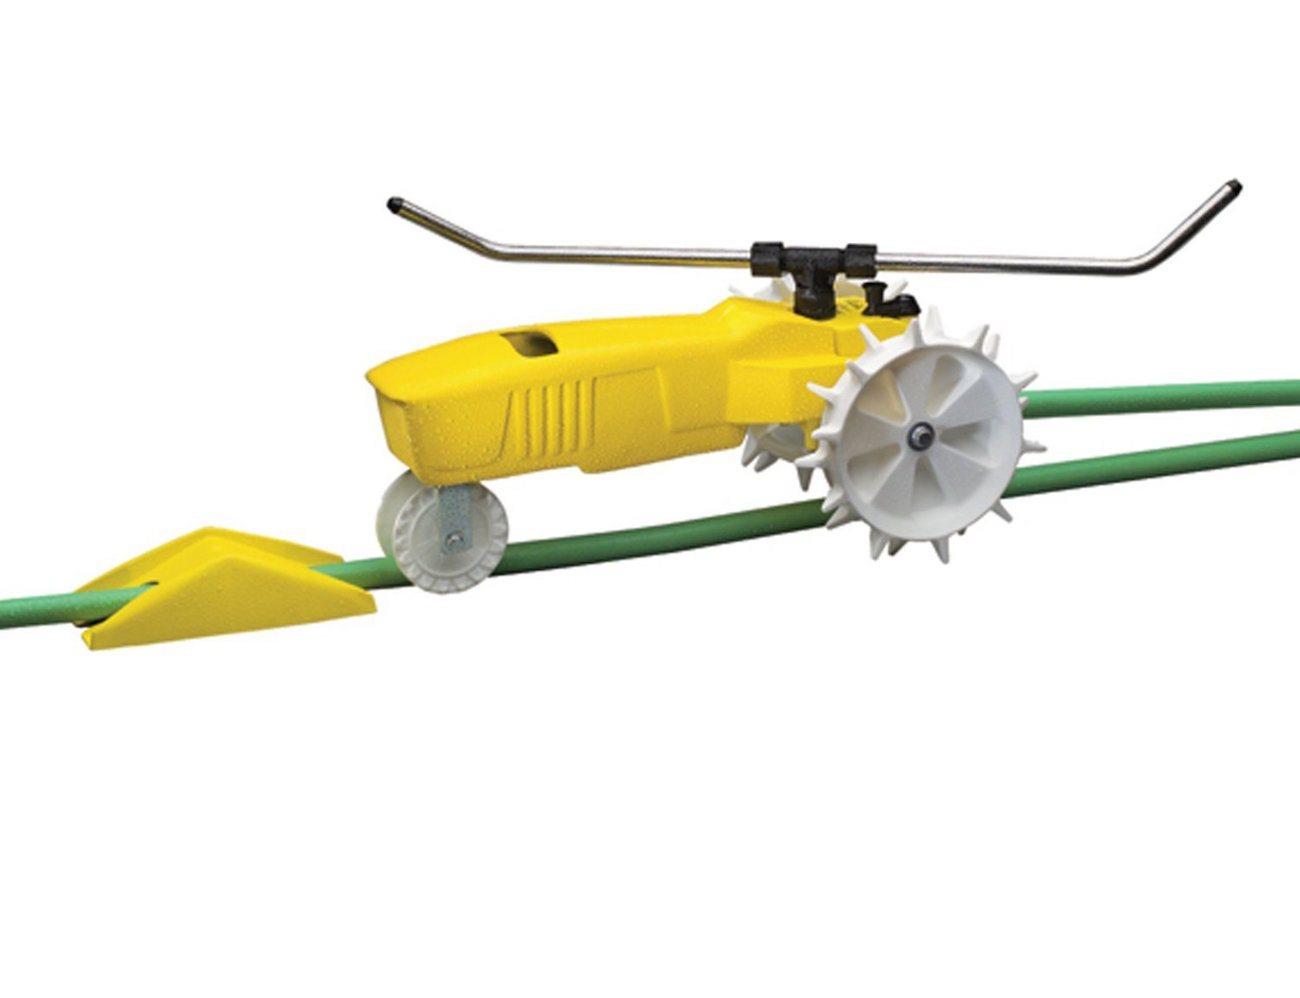 Raintrain Traveling Sprinkler For Your Lawn